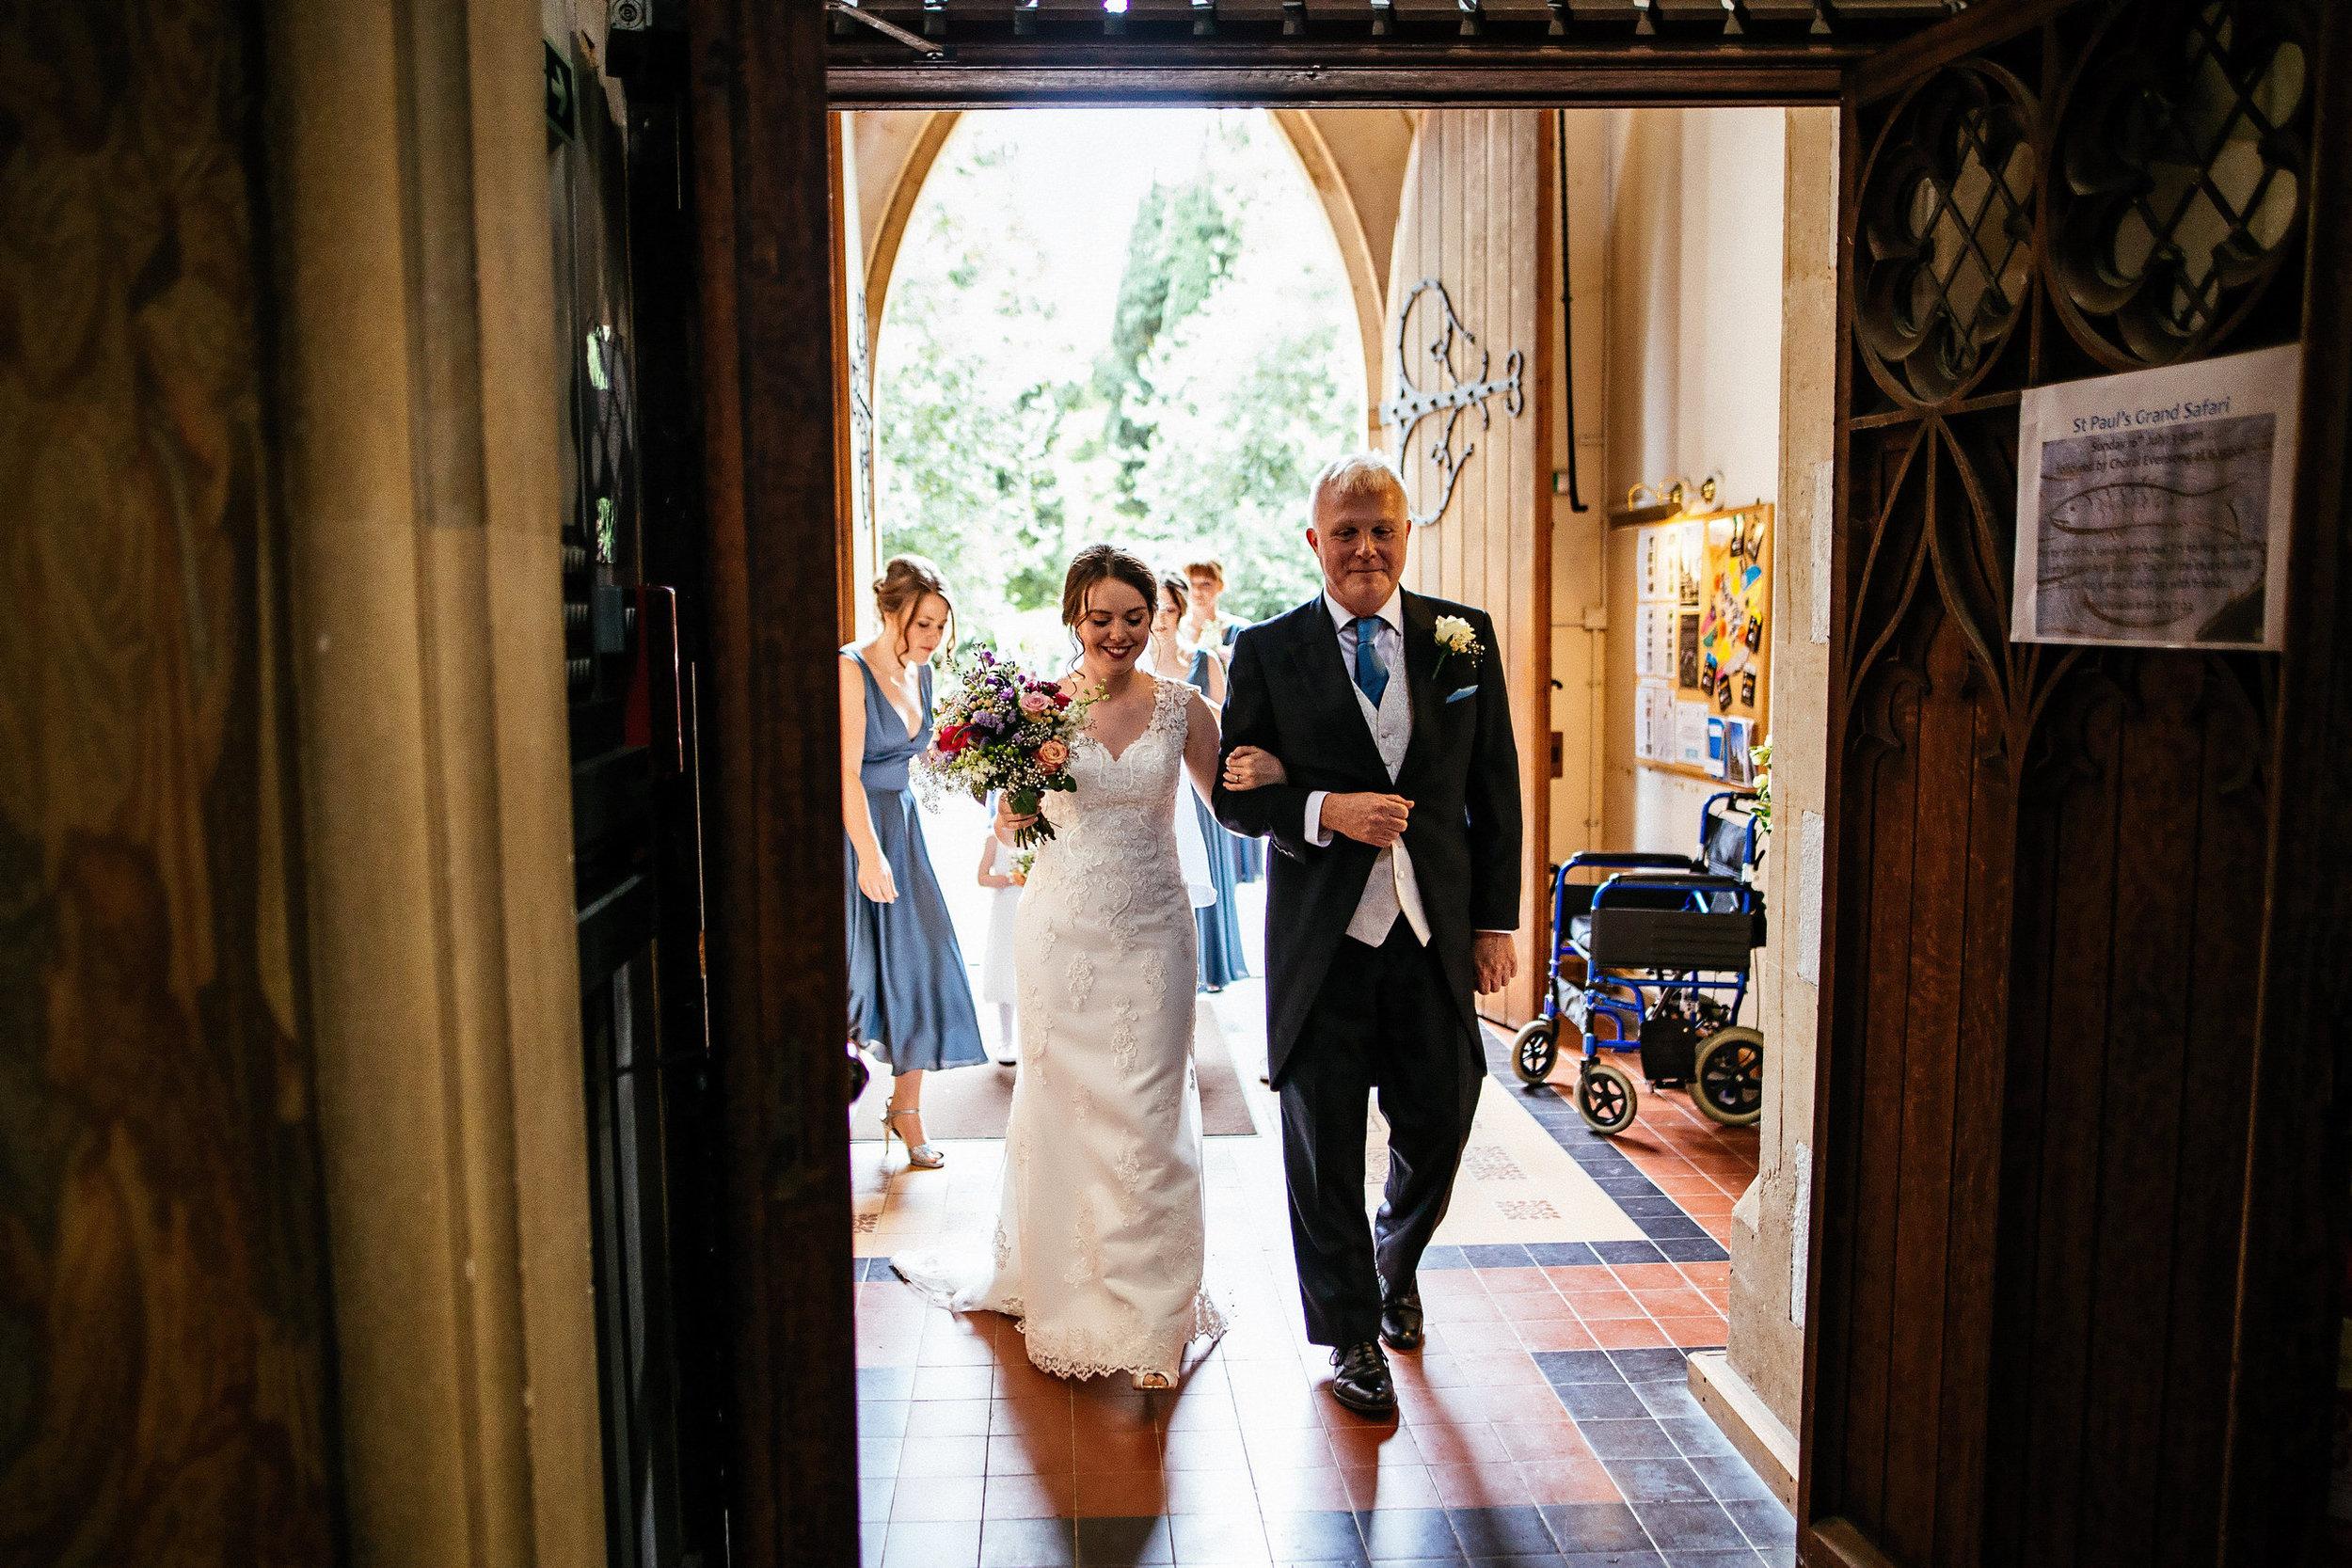 Florence-and-Ben-Wedding-Highlights-31.jpg